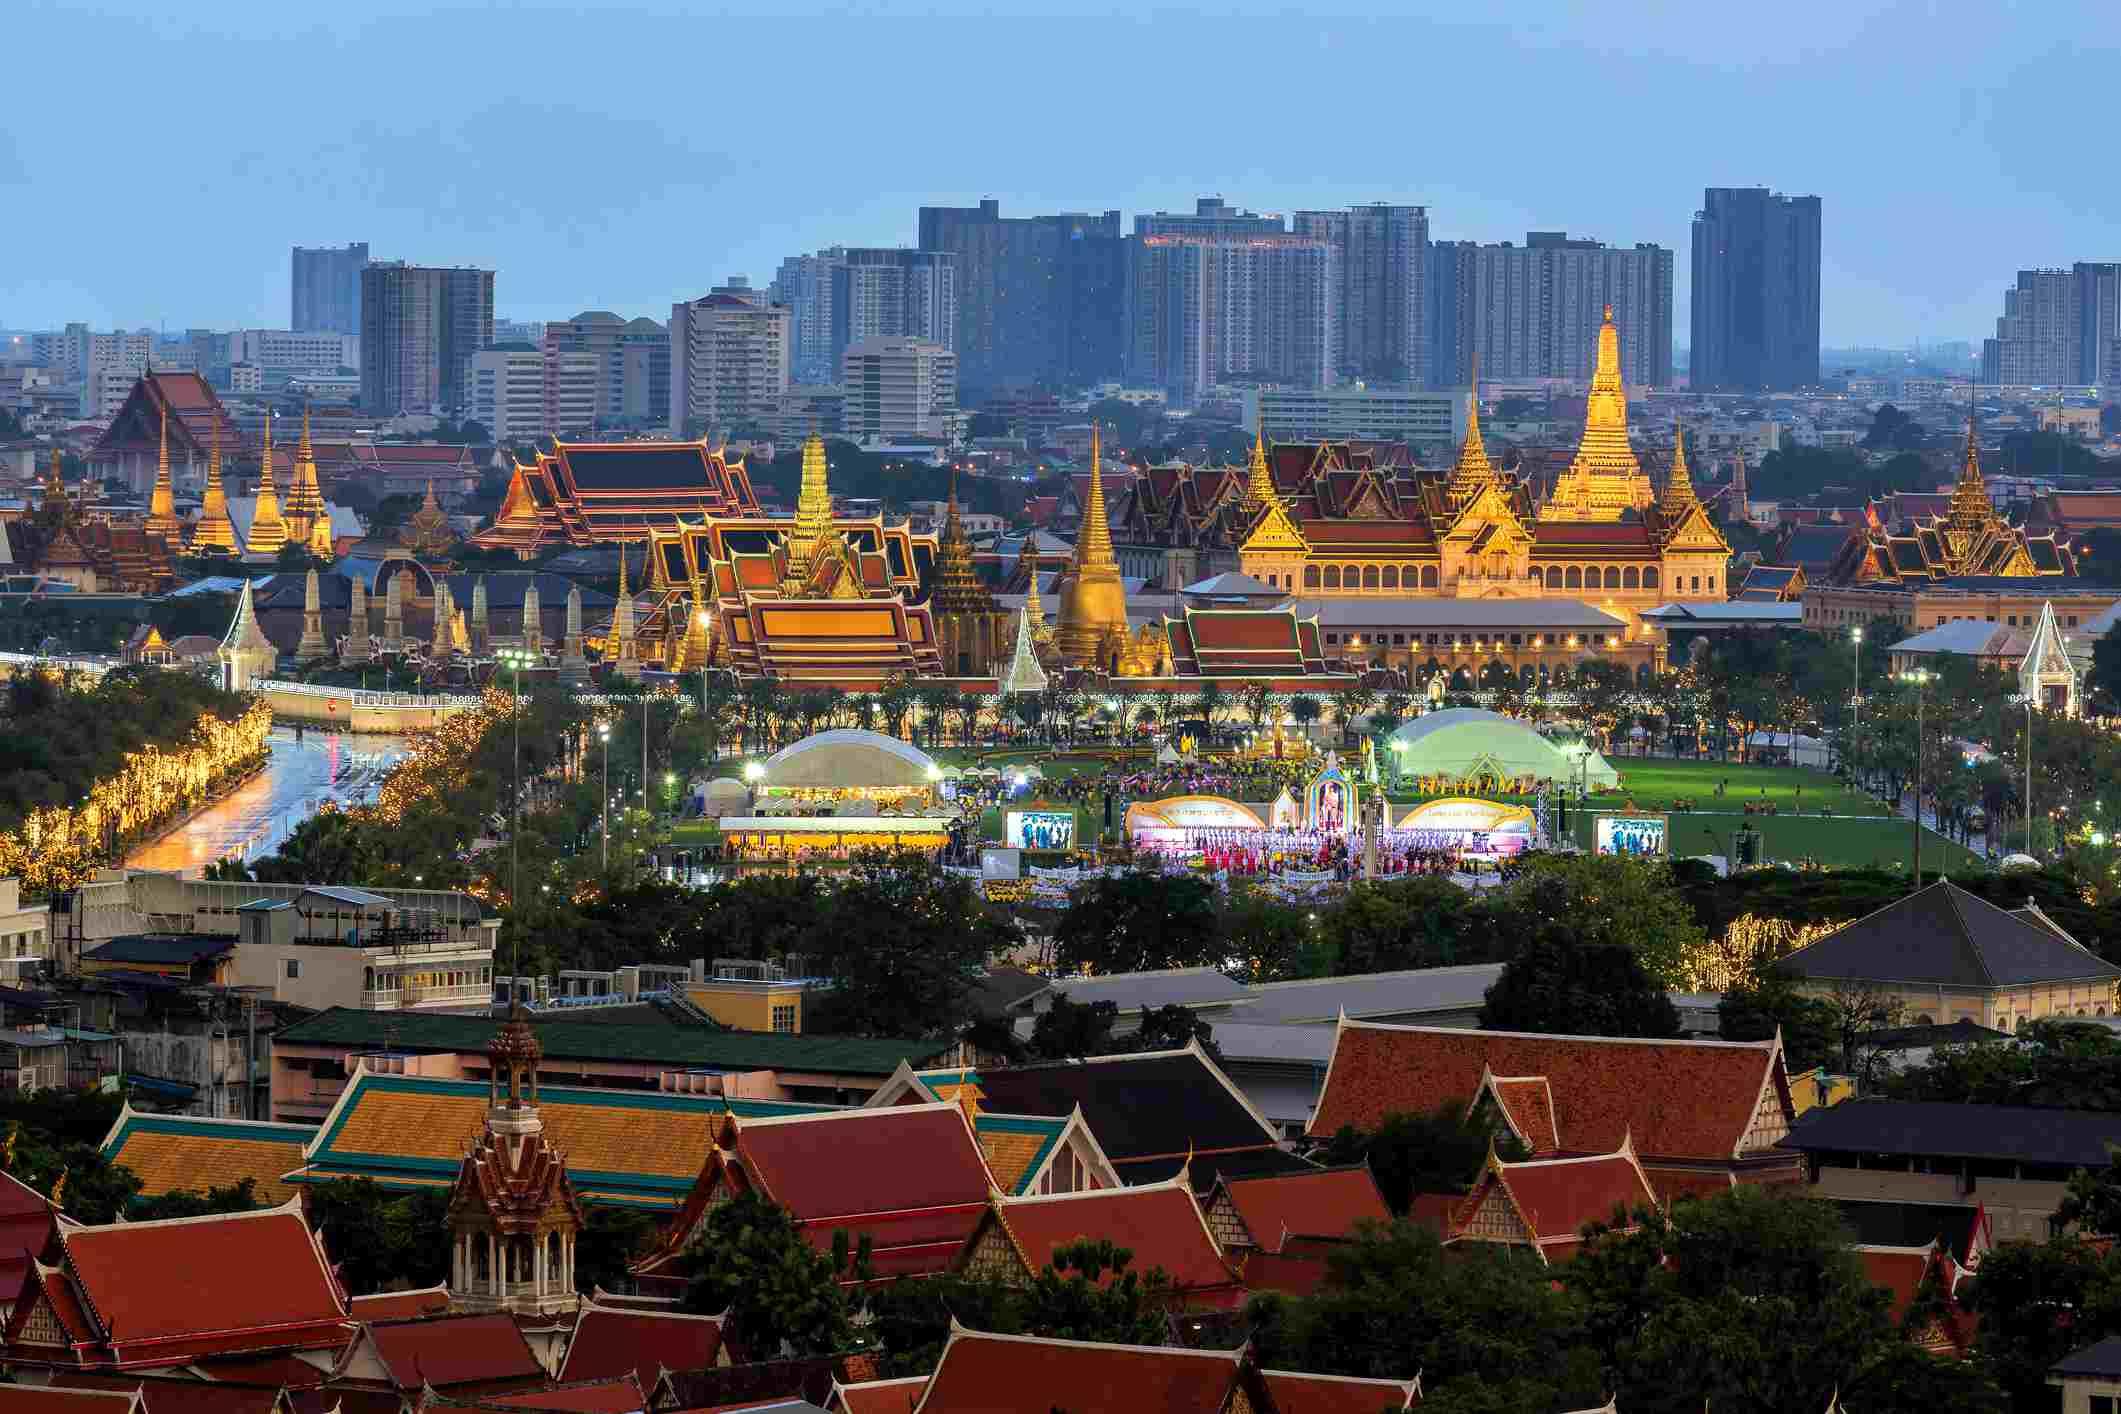 66th birthday celebration of His Majesty King Maha Vajiralongkorn at Grand Palace,Wat Phra Kaew